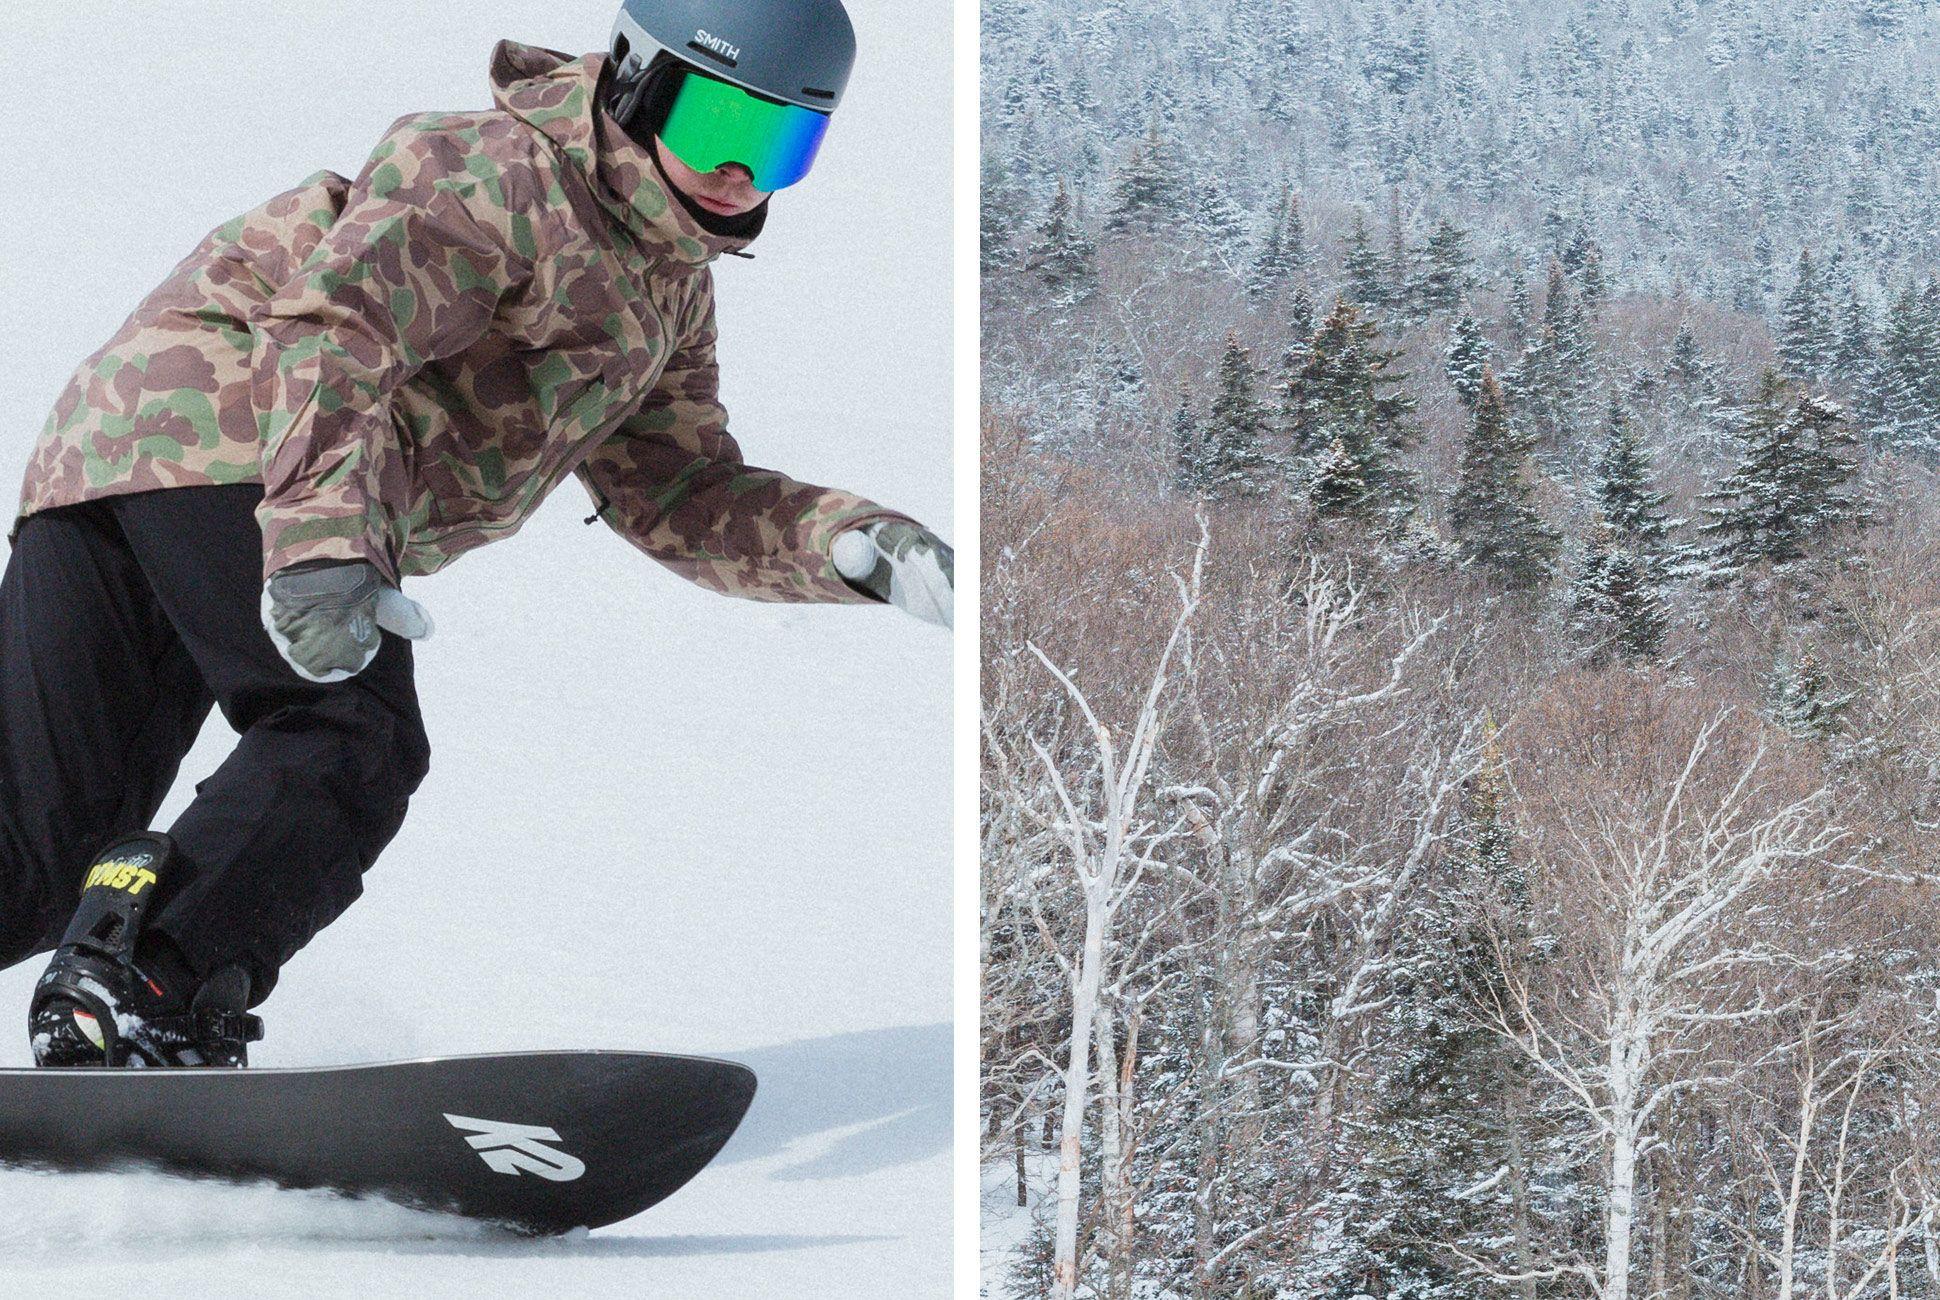 ultimate-ski-and-snow-gear-patrol-burton-slide-5